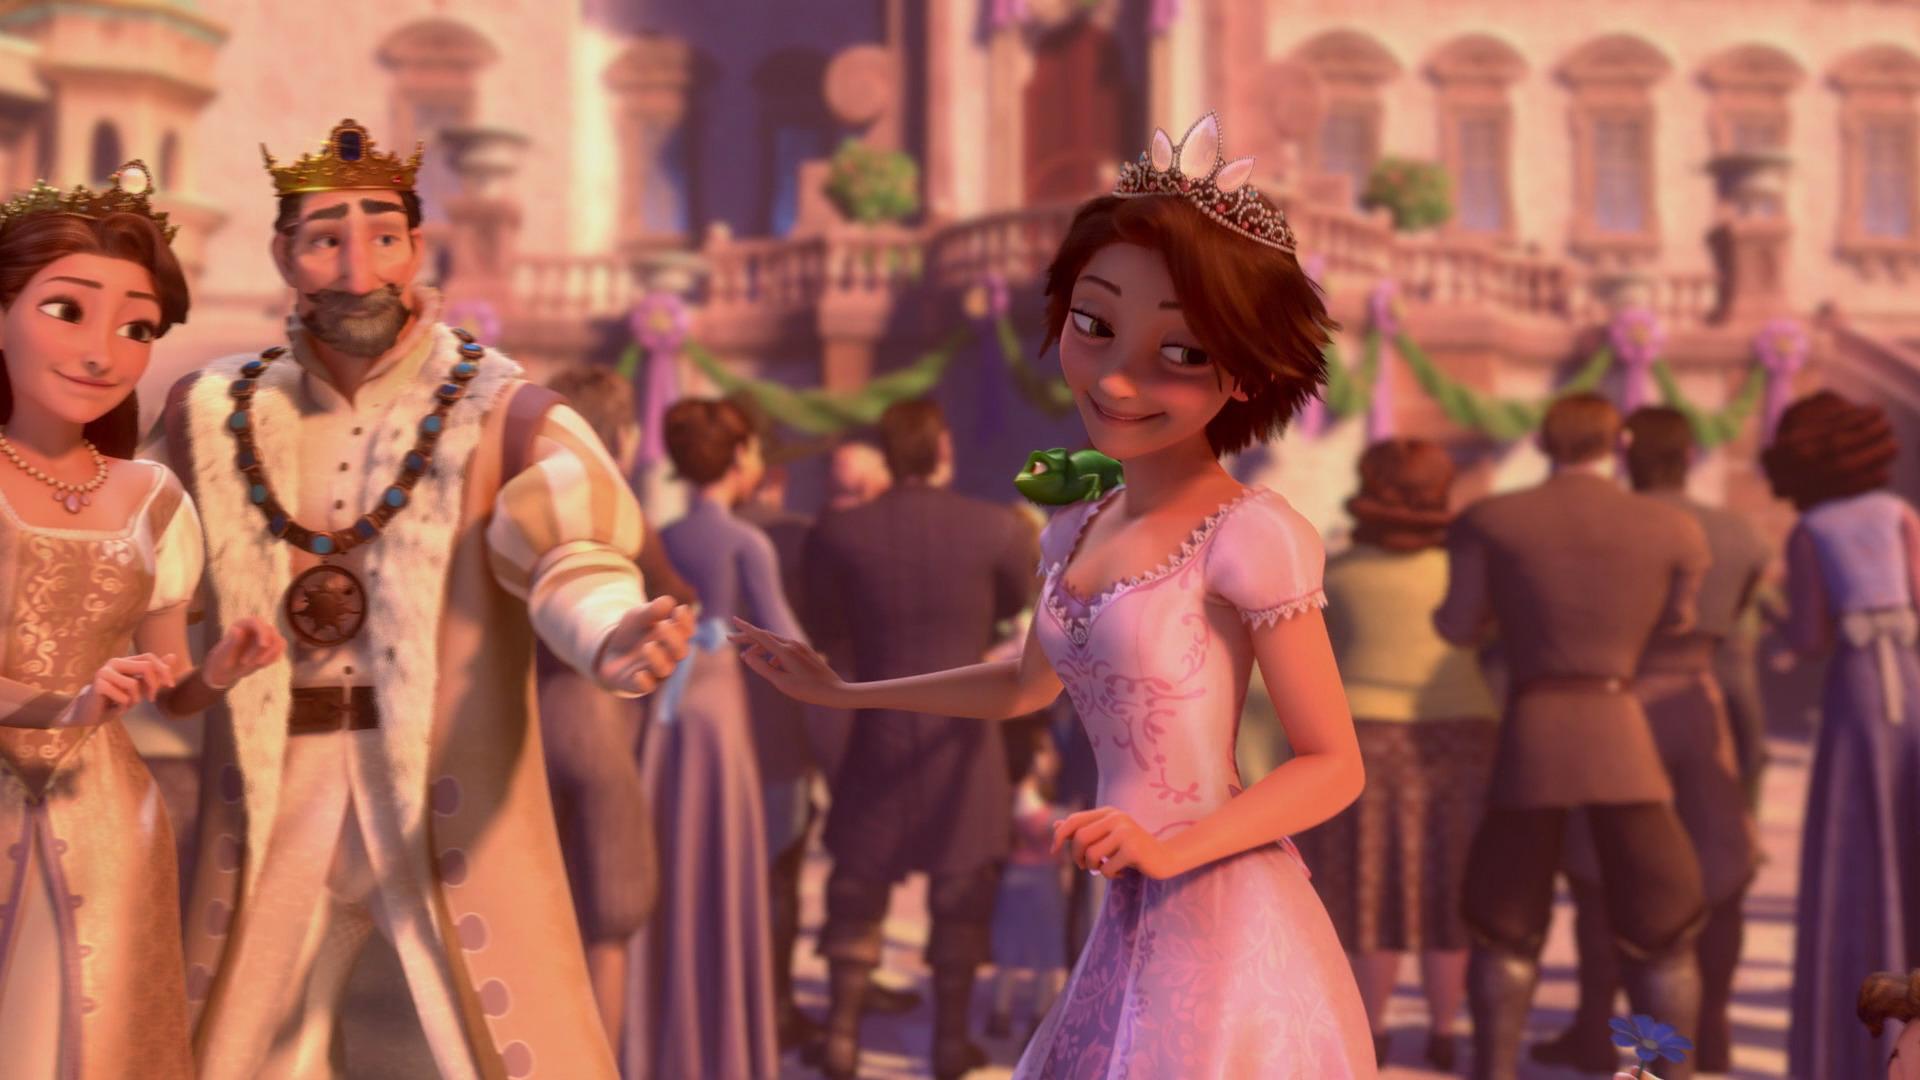 Princess Rapunzel Ending Rapunzel Of Disney S Tangled Photo 35423069 Fanpop